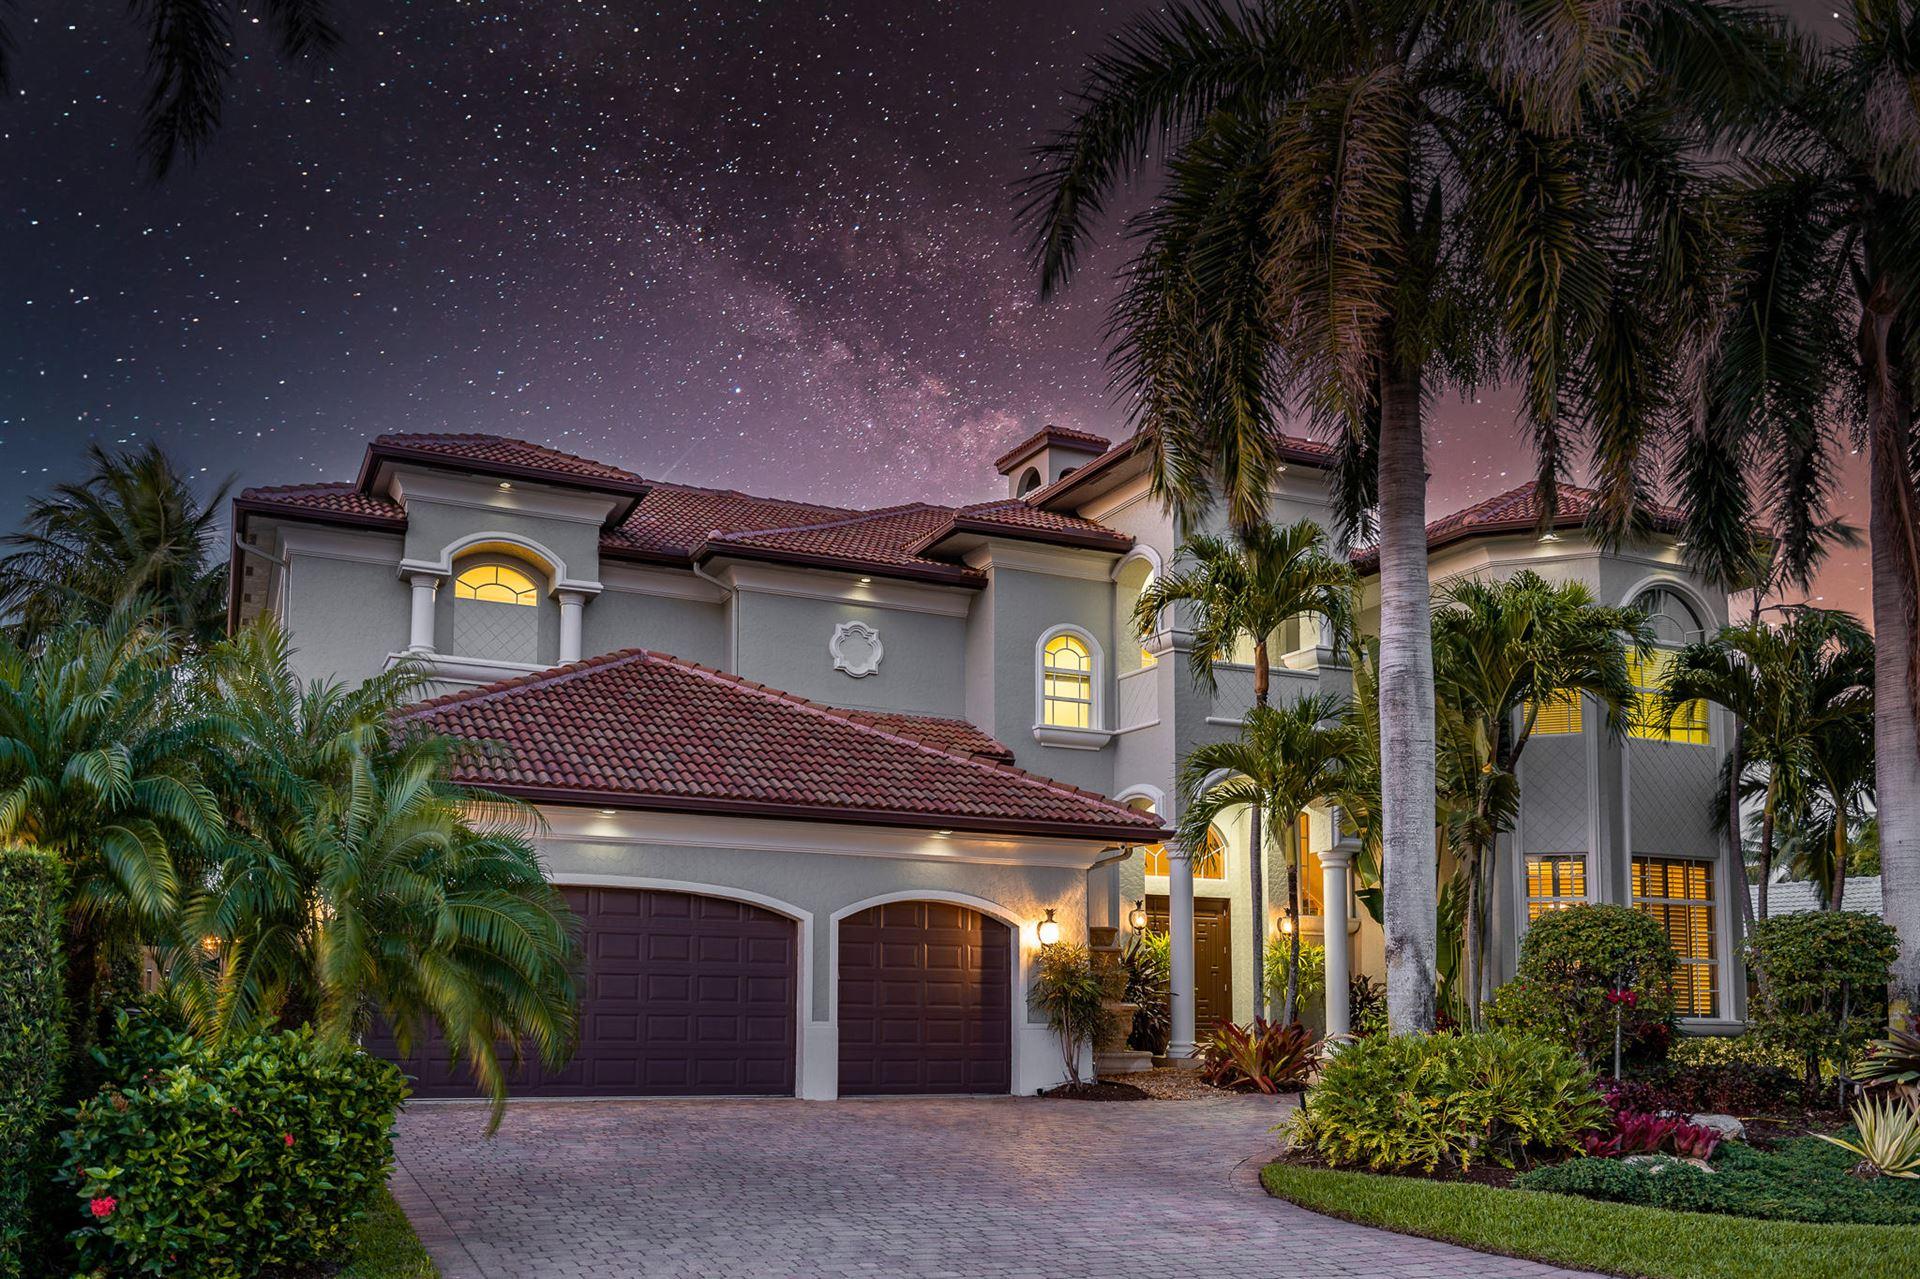 945 Banyan Drive, Delray Beach, FL 33483 - #: RX-10710868